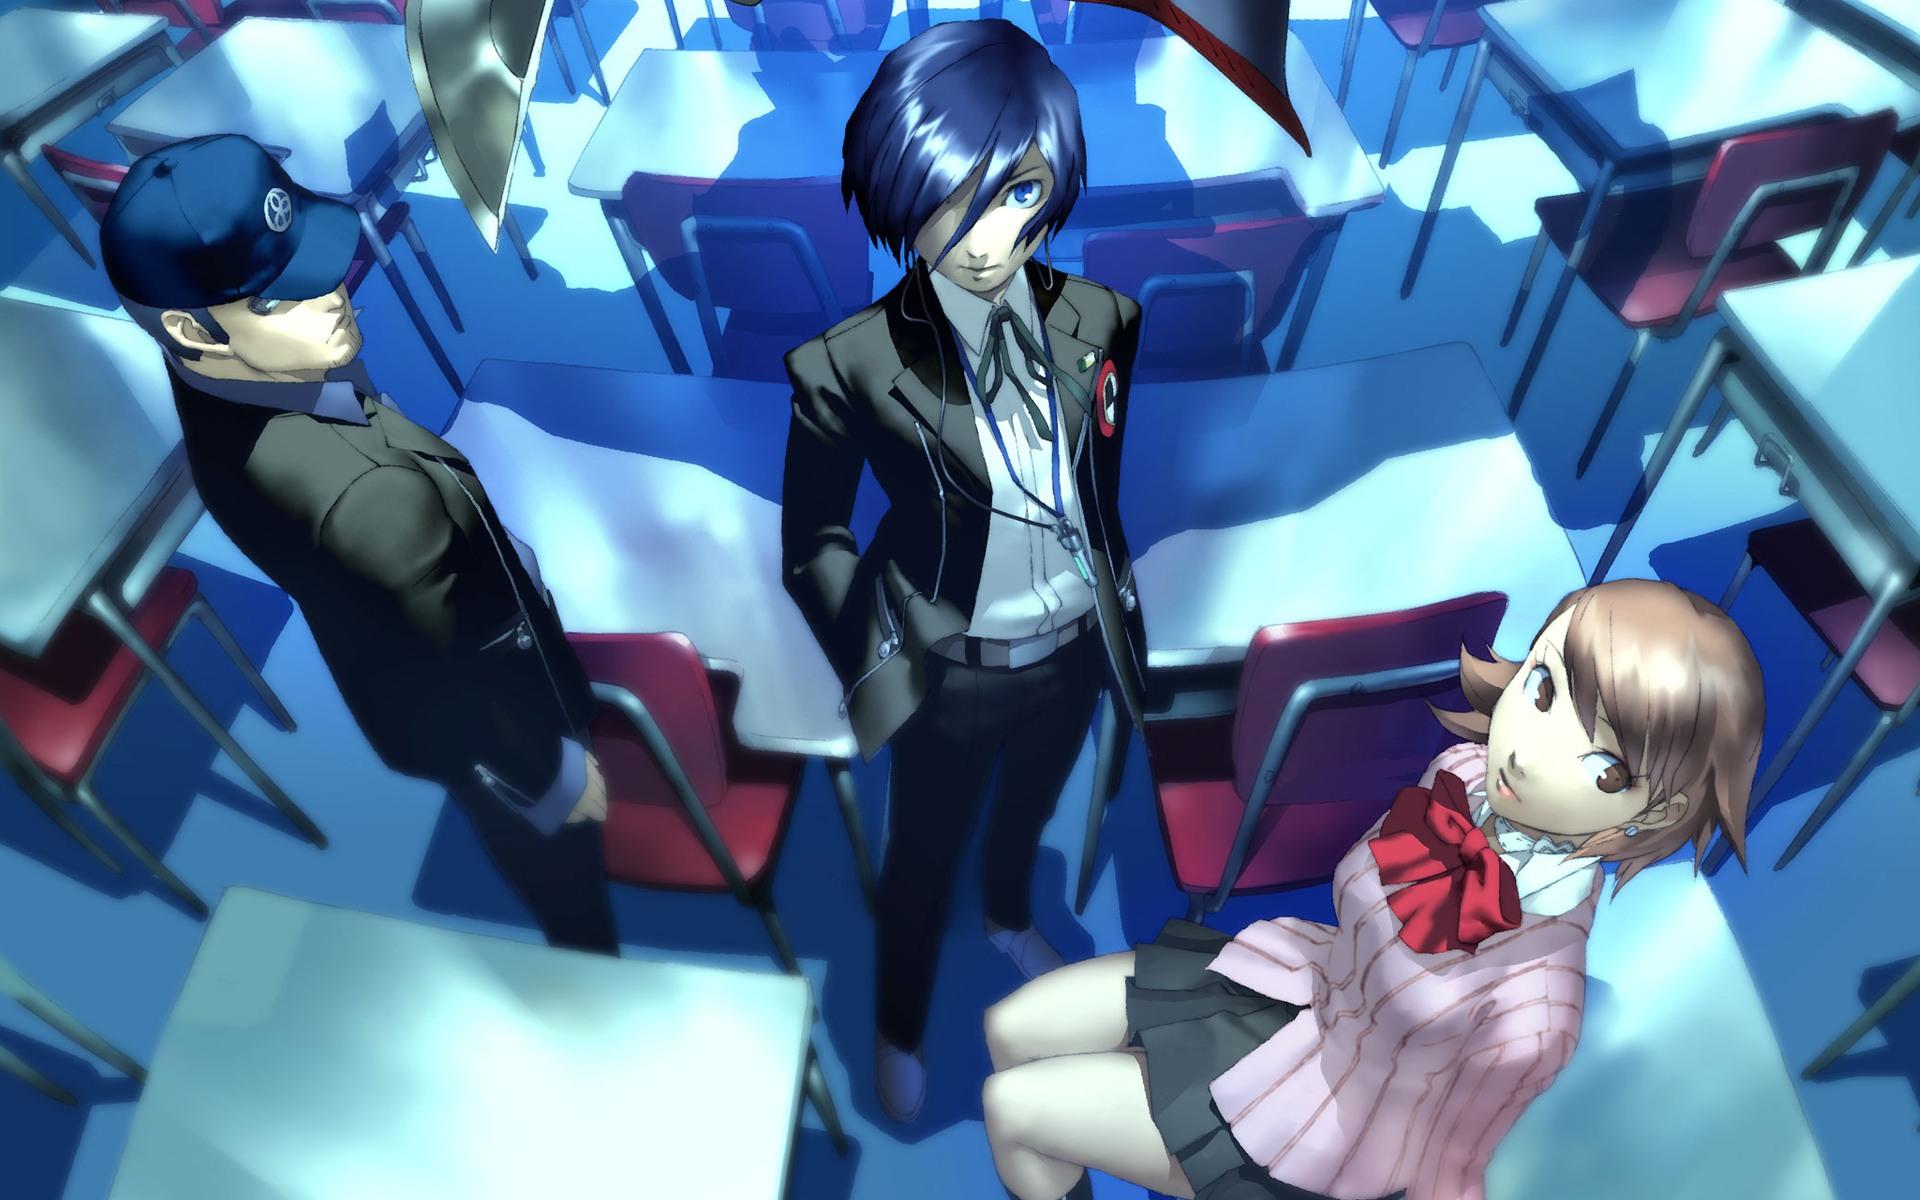 45+] Persona 3 Wallpaper HD on WallpaperSafari